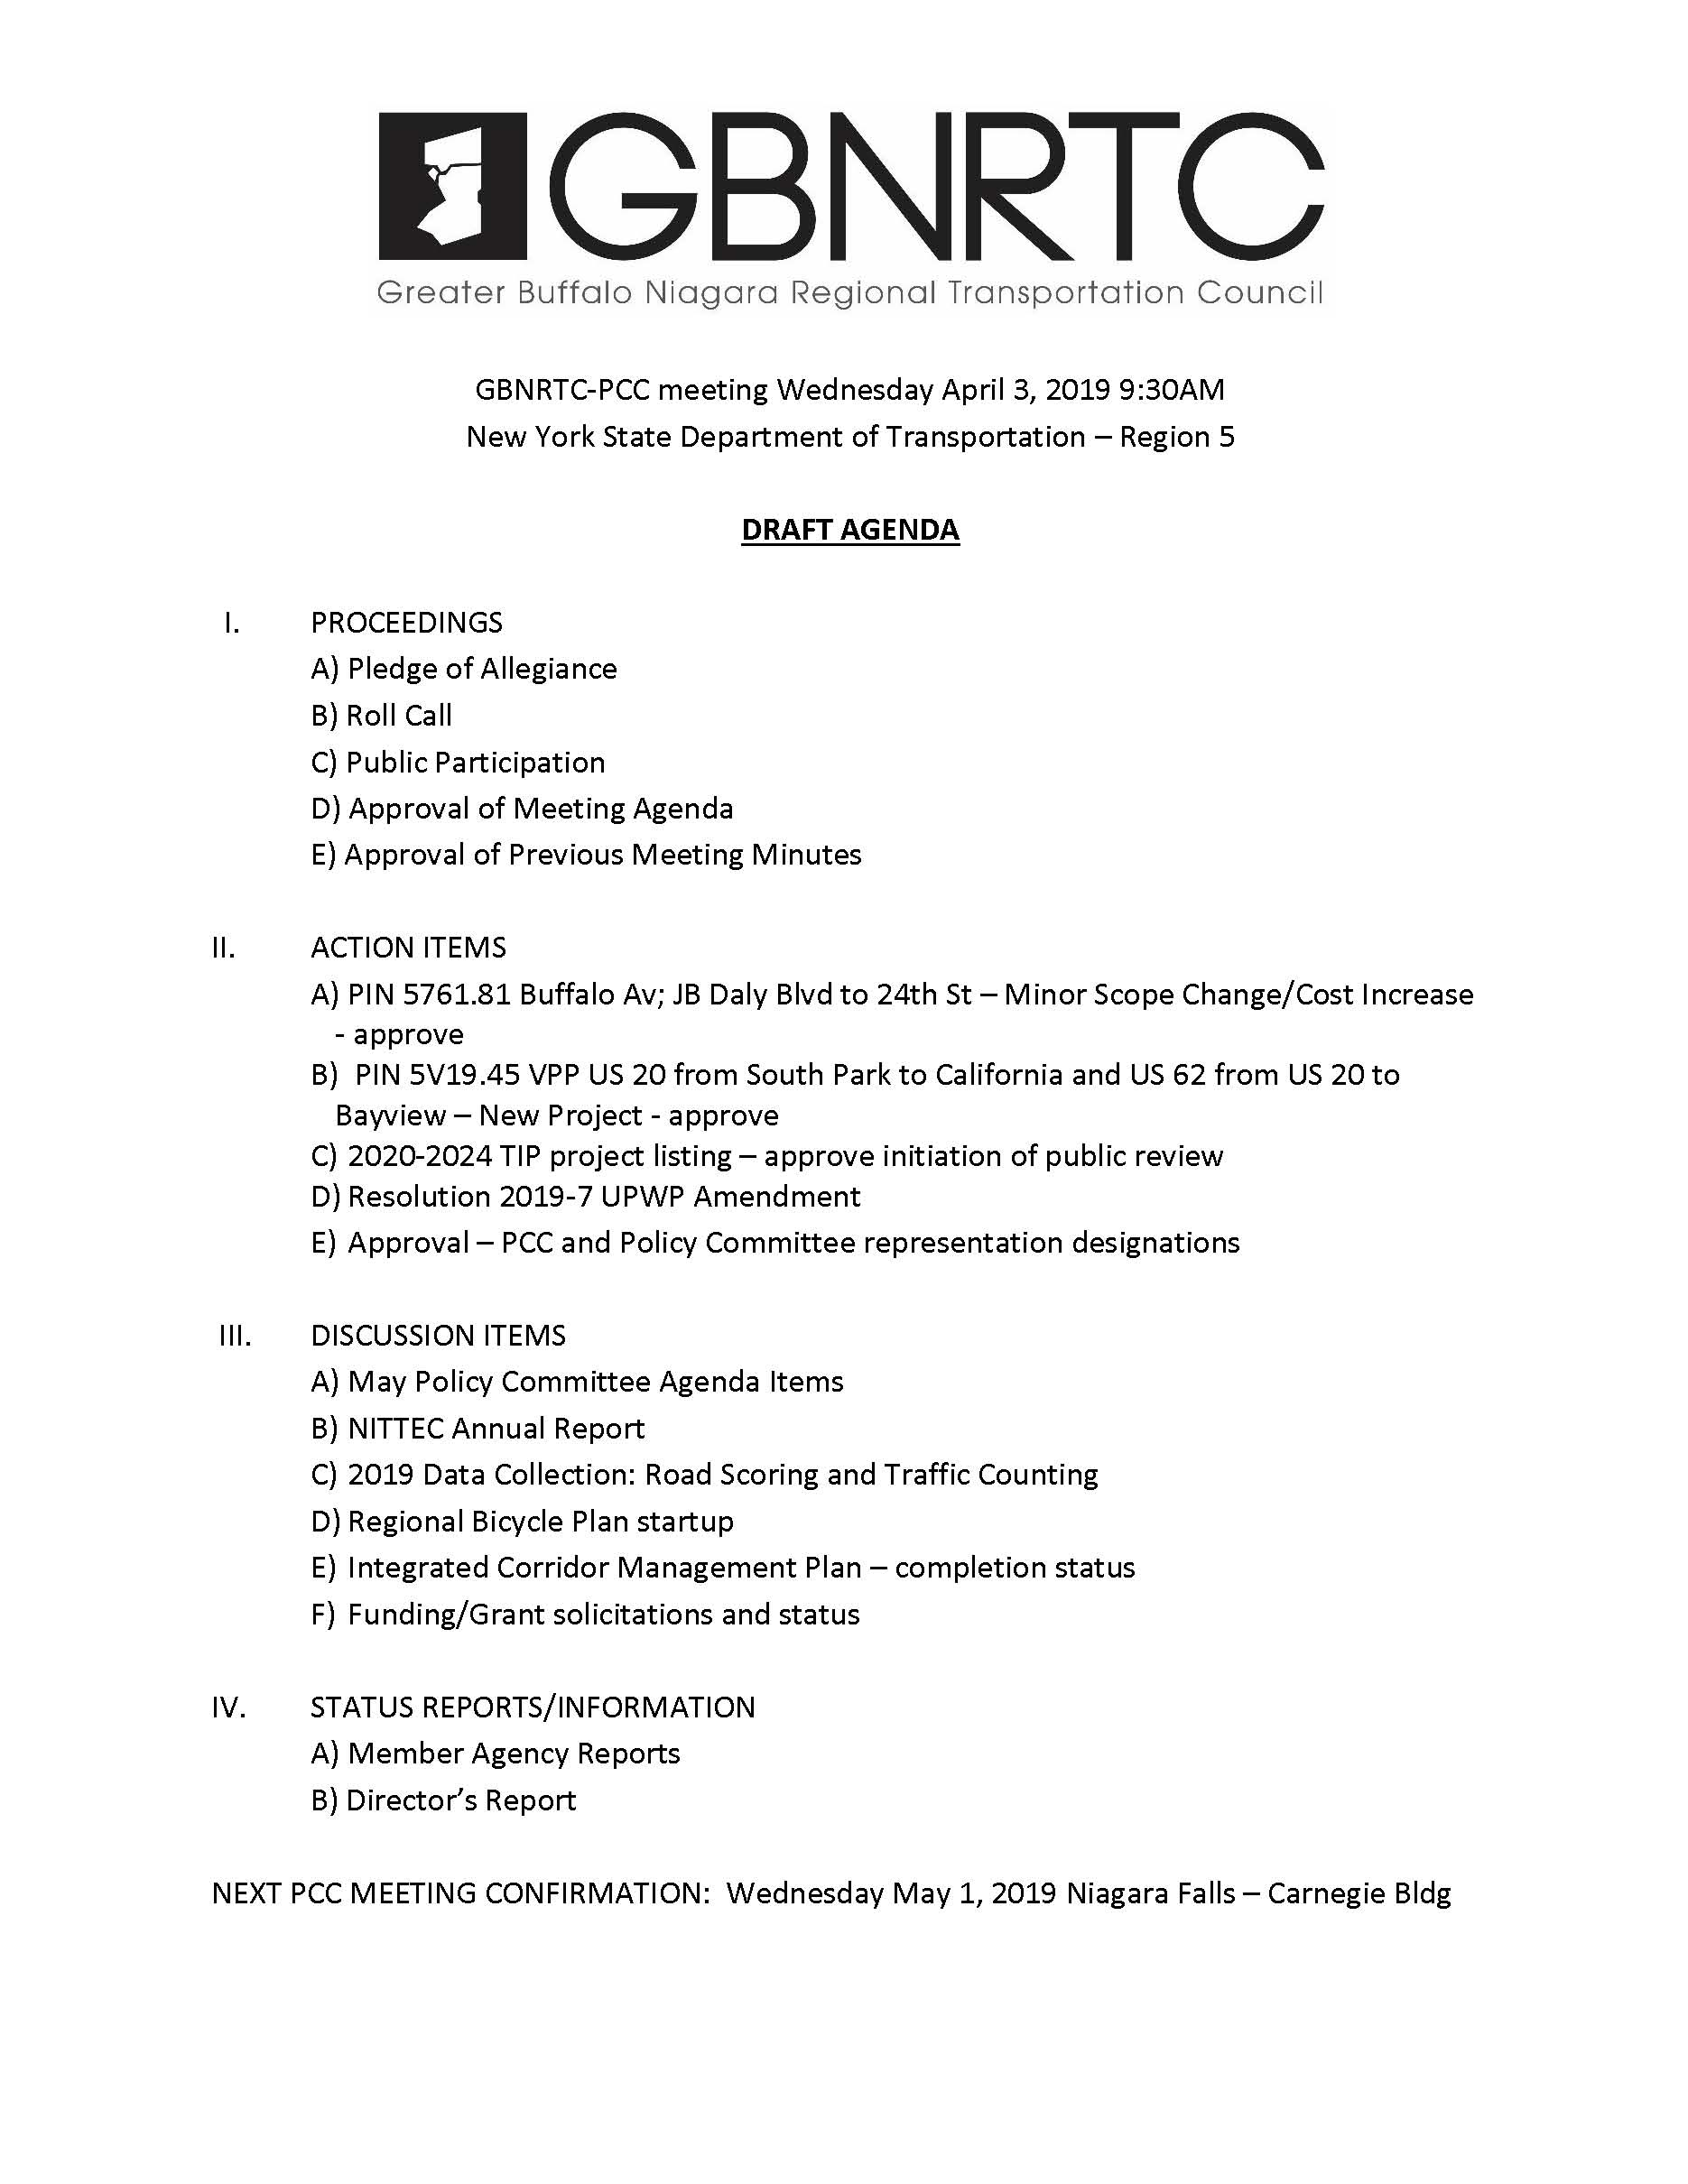 PCC Agenda-4-3-2019.jpg